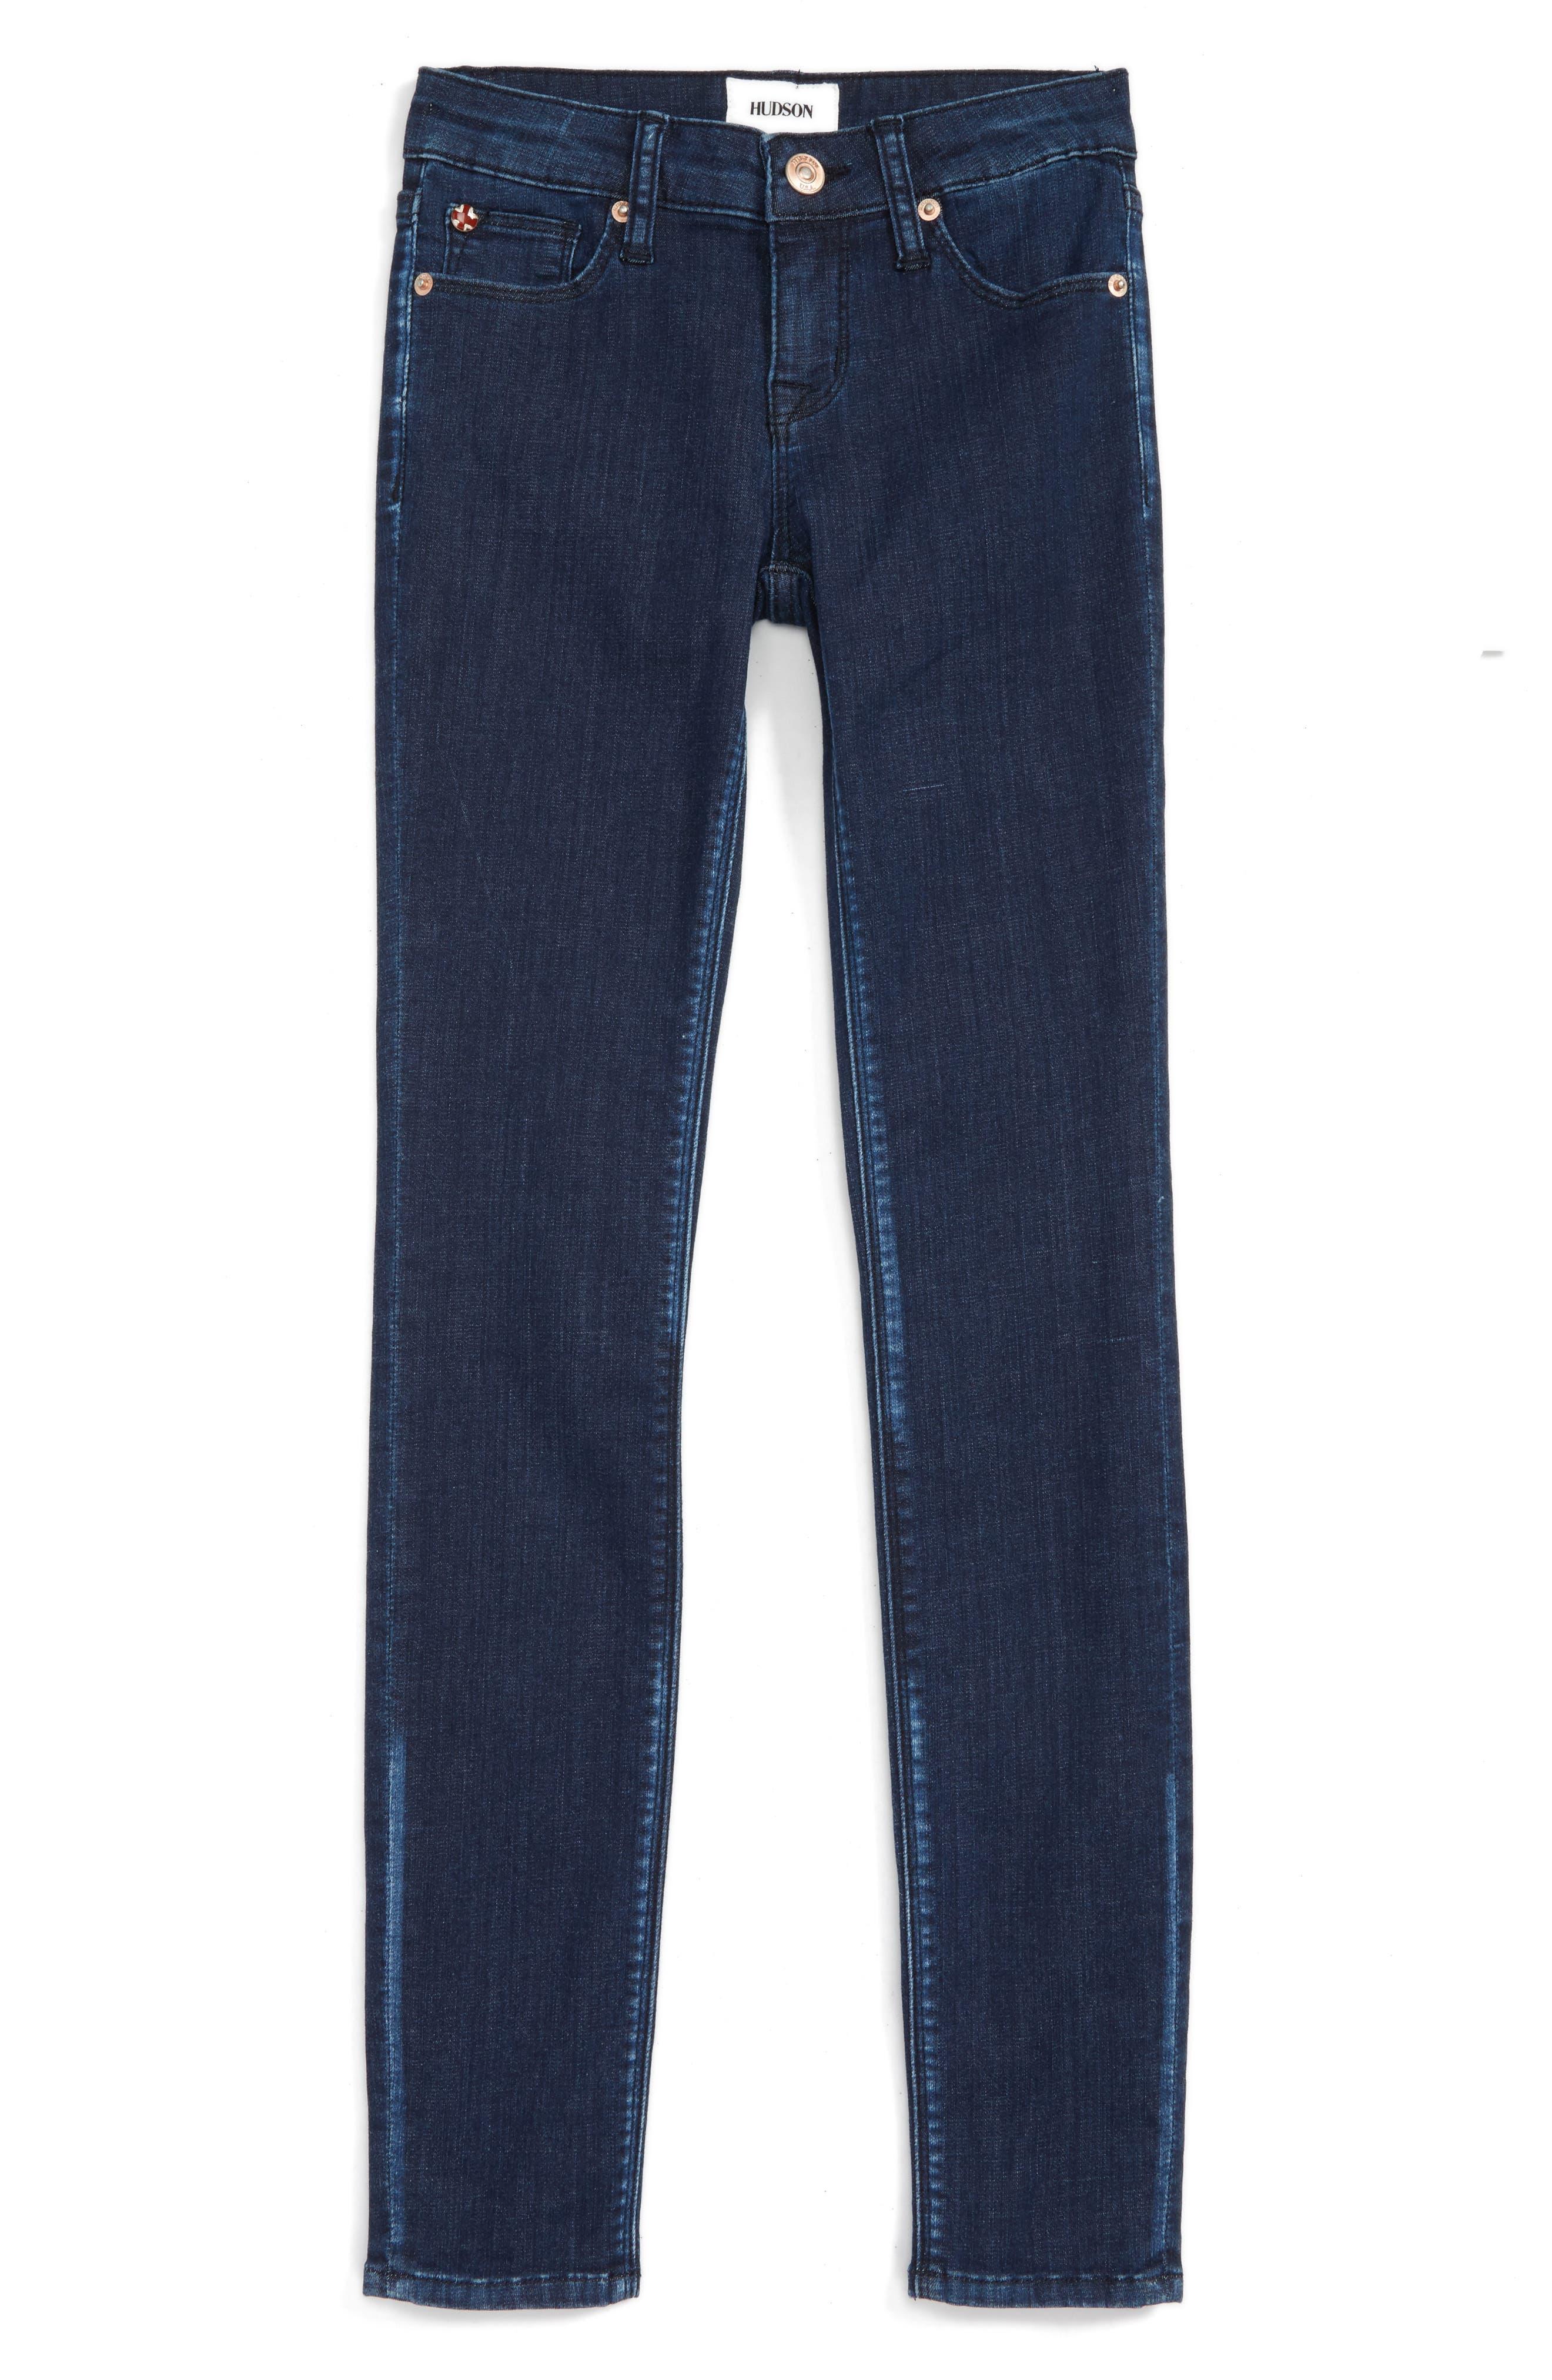 Main Image - Hudson Kids Dolly Skinny Jeans (Big Girls)